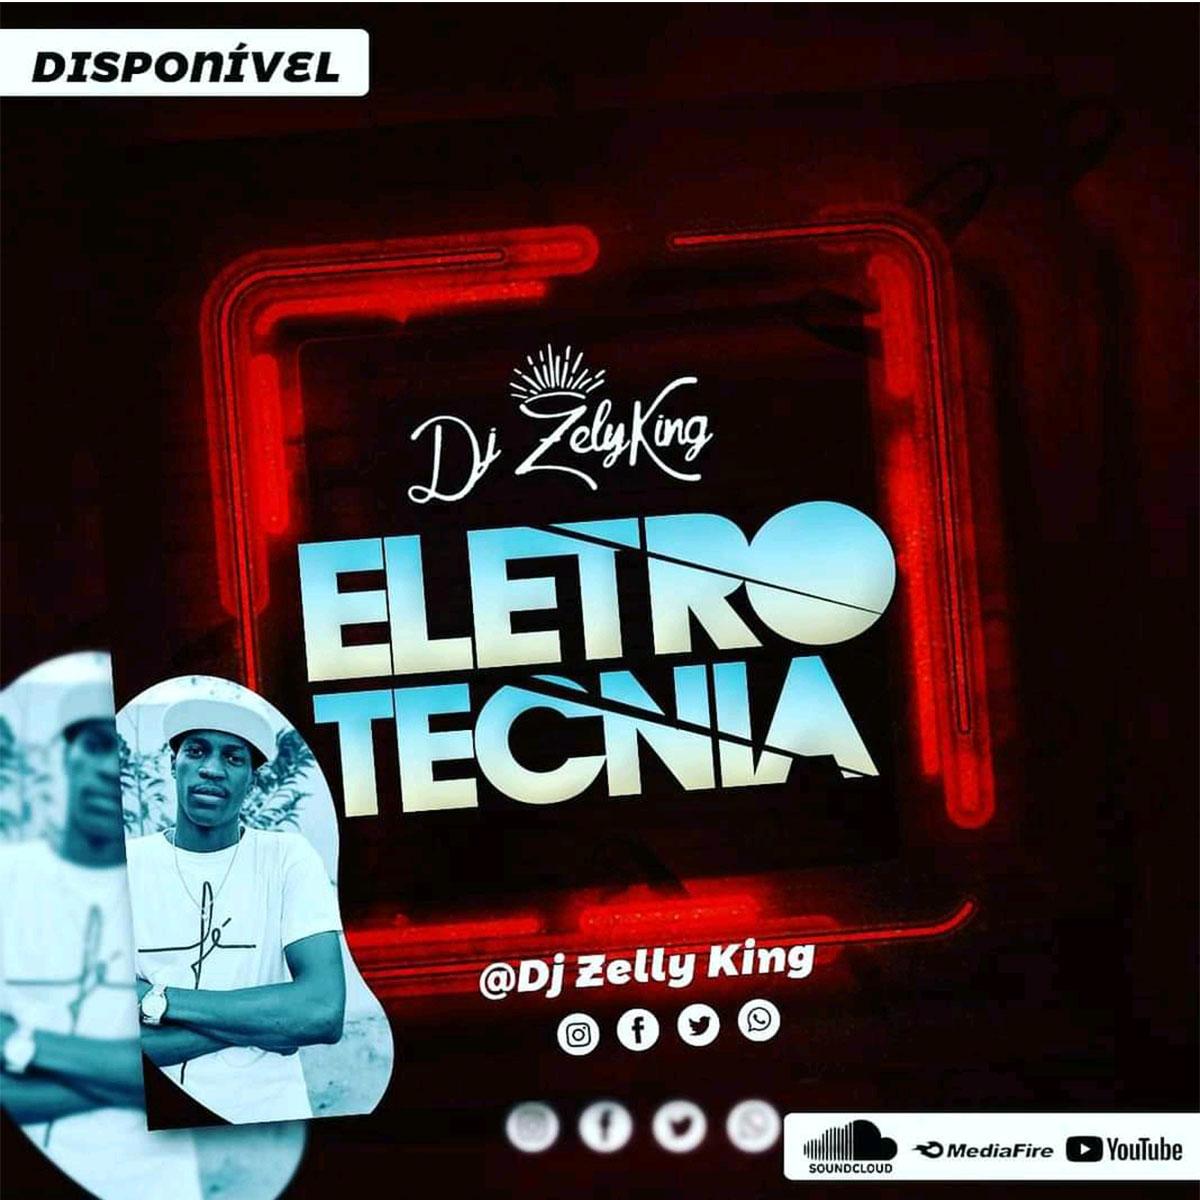 DJ ZelyKinG- Eletrotecnia (Original Mix)